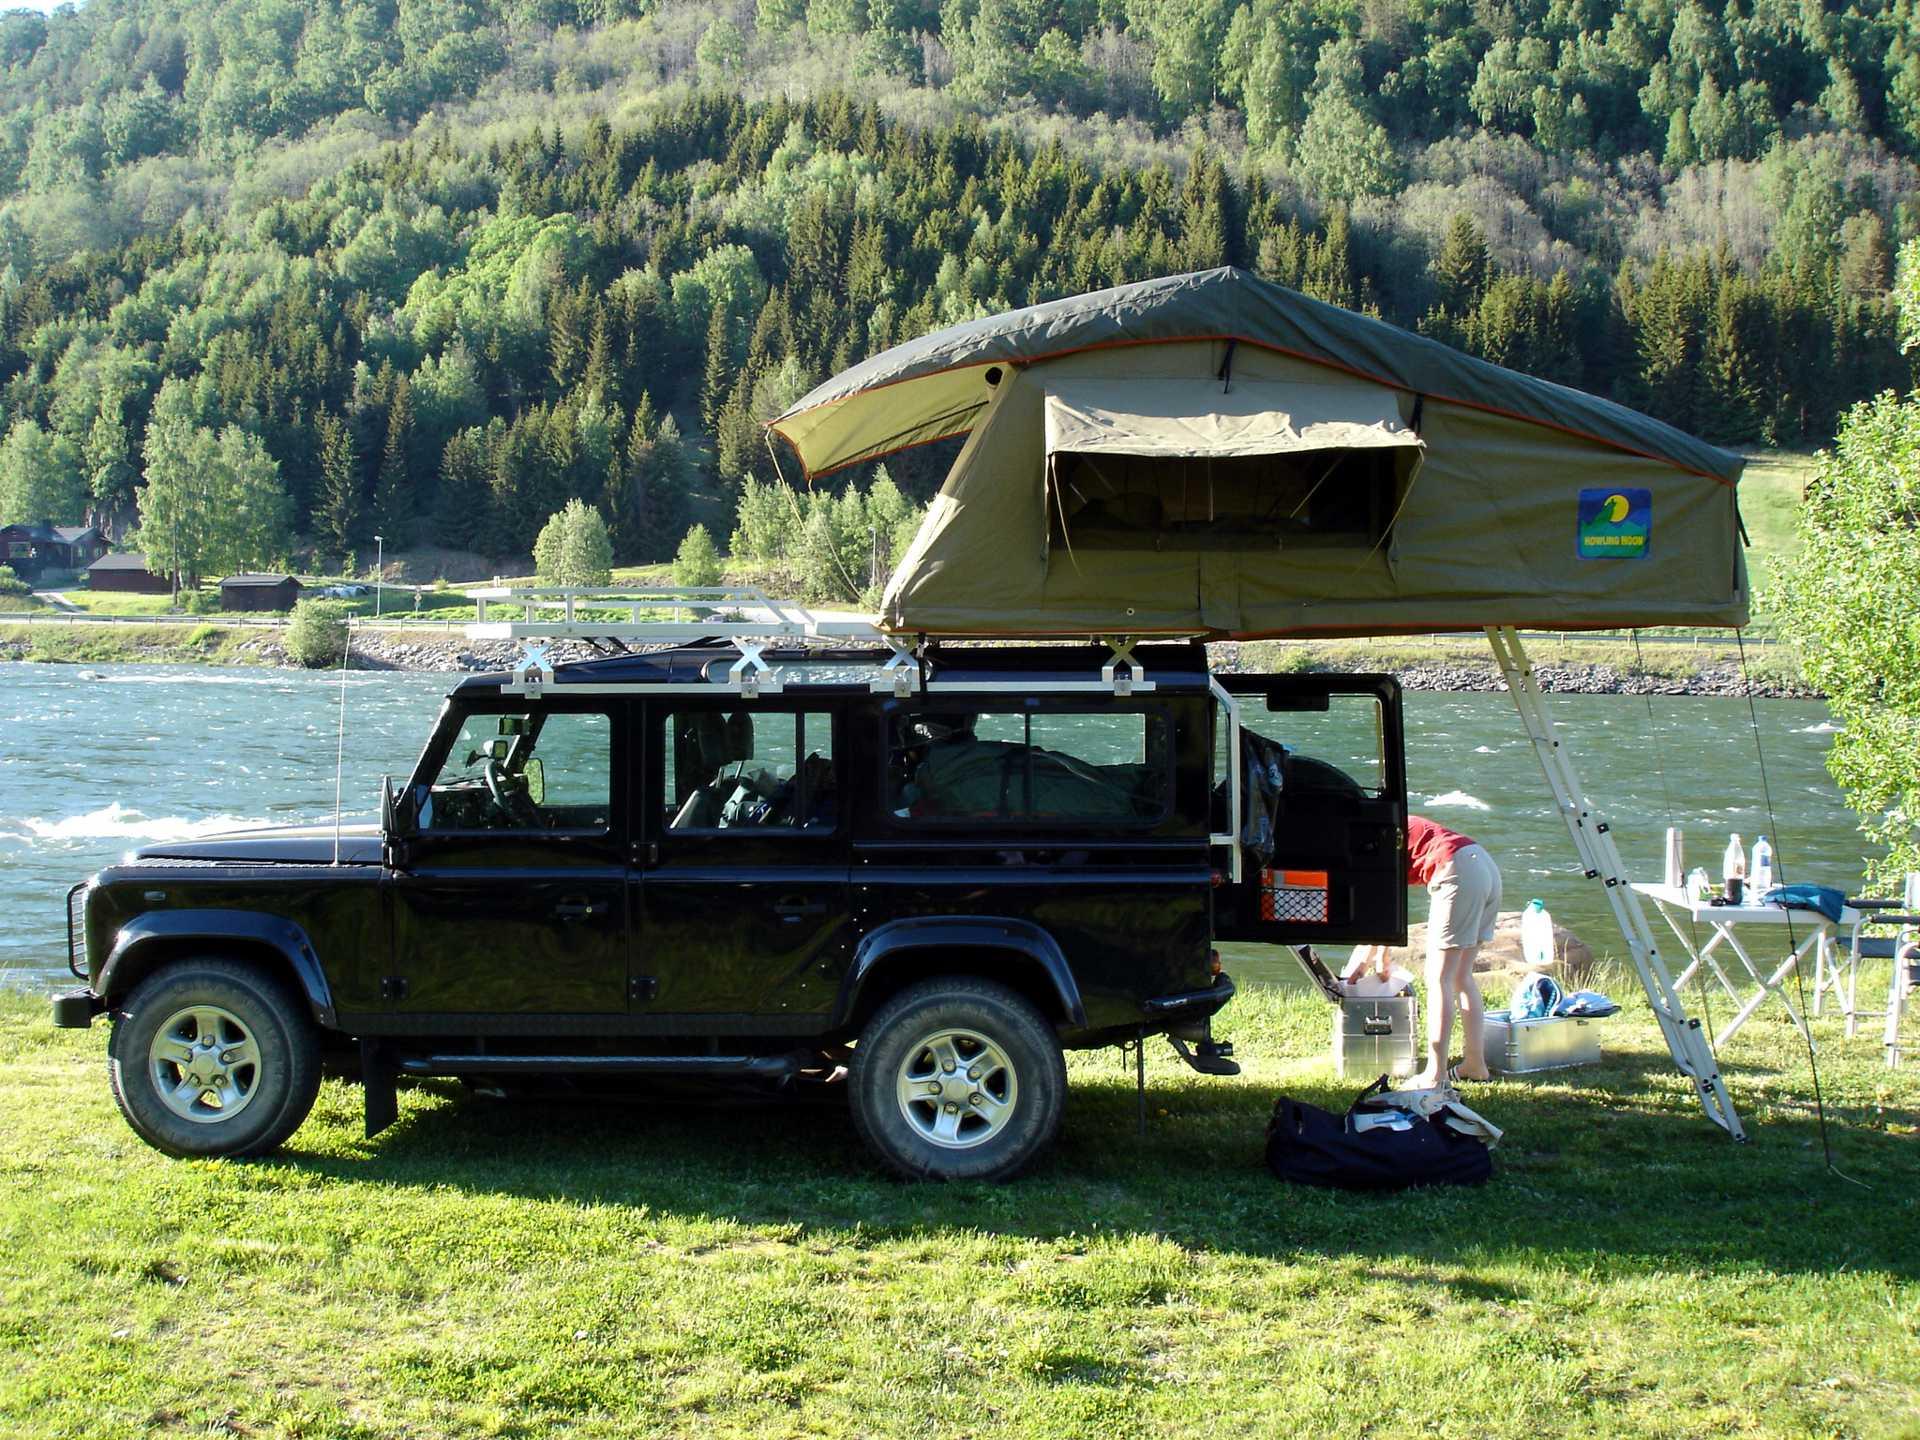 Zelt Für Defender : Reisemobil defender safari tracks